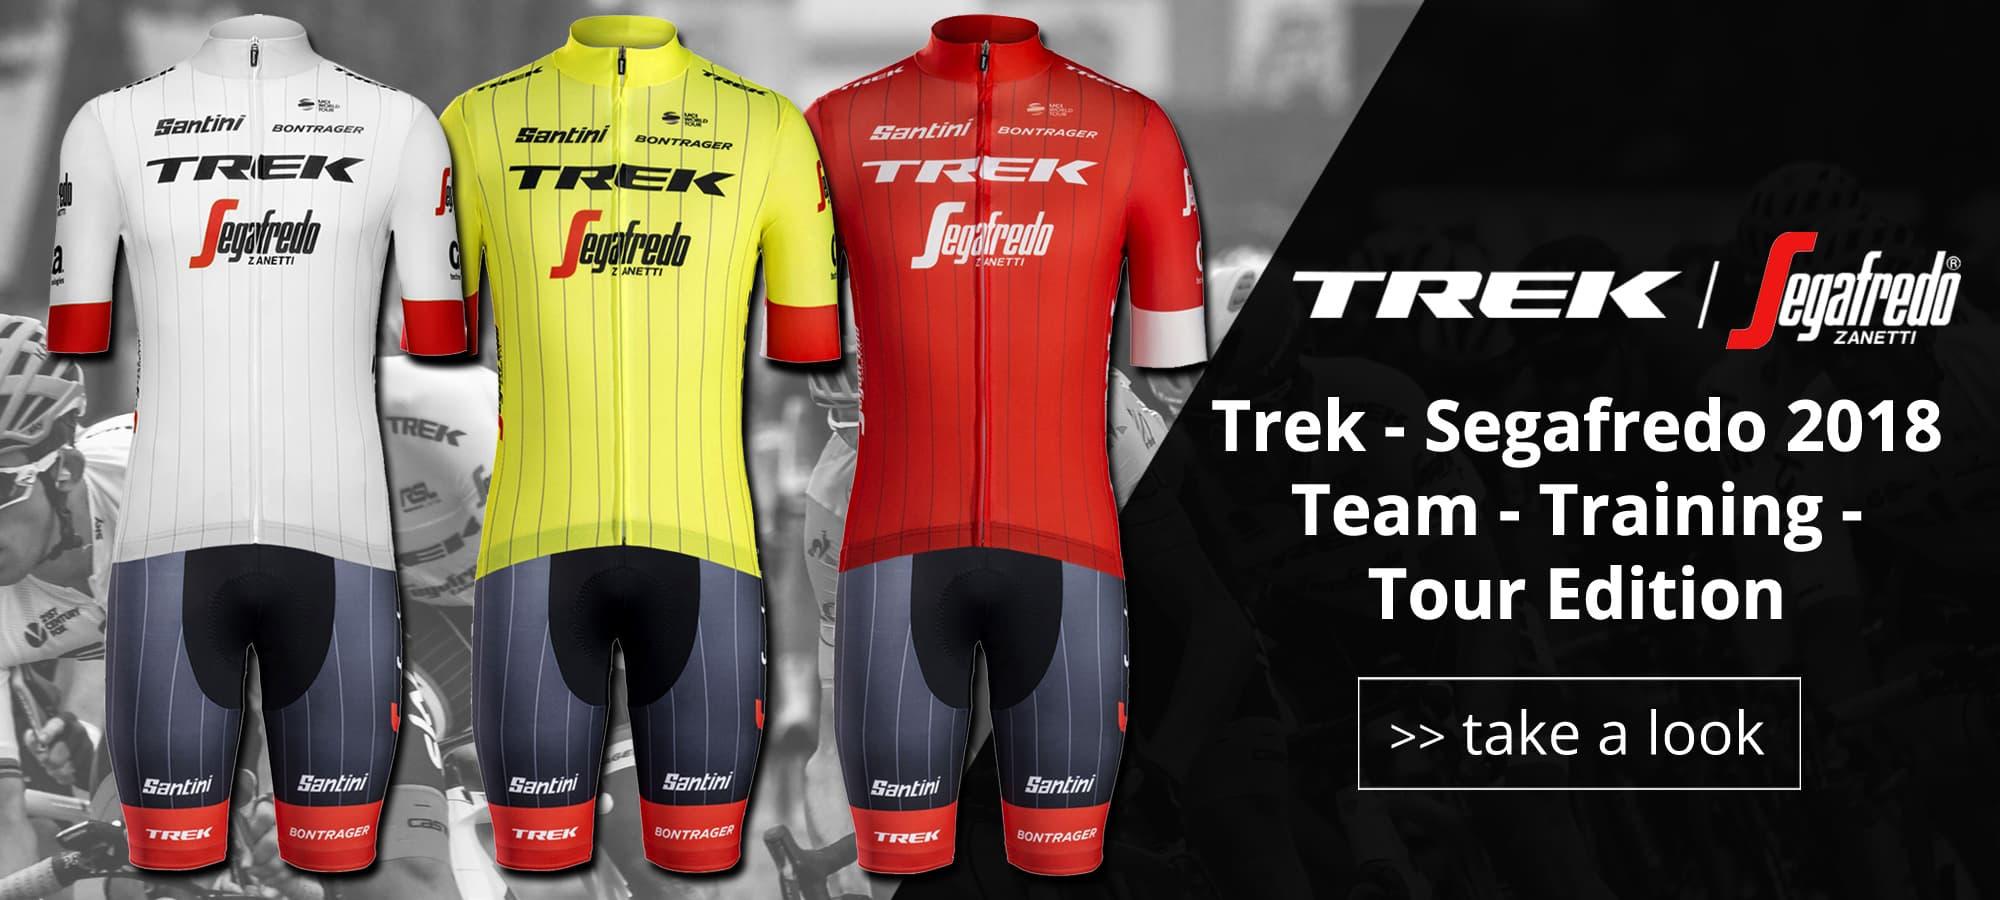 Trek - Segafredo Team, Training and Tour Edition